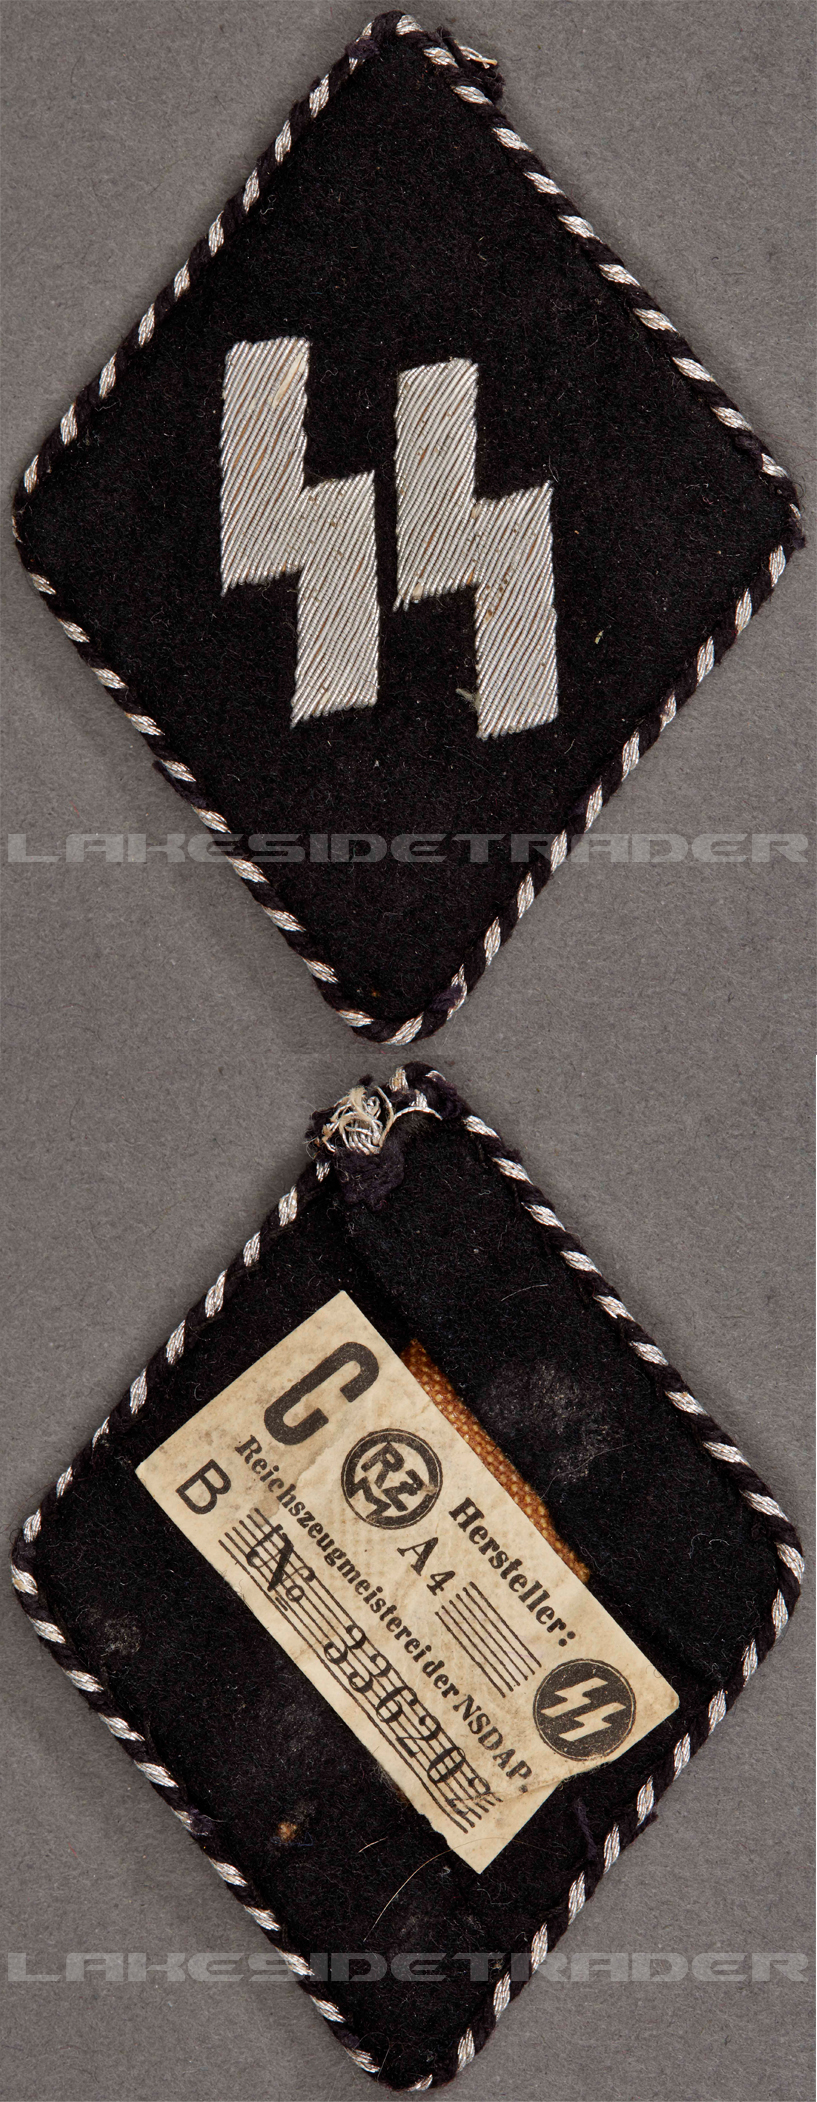 Tagged – Officers Germanic SS Sleeve Diamond